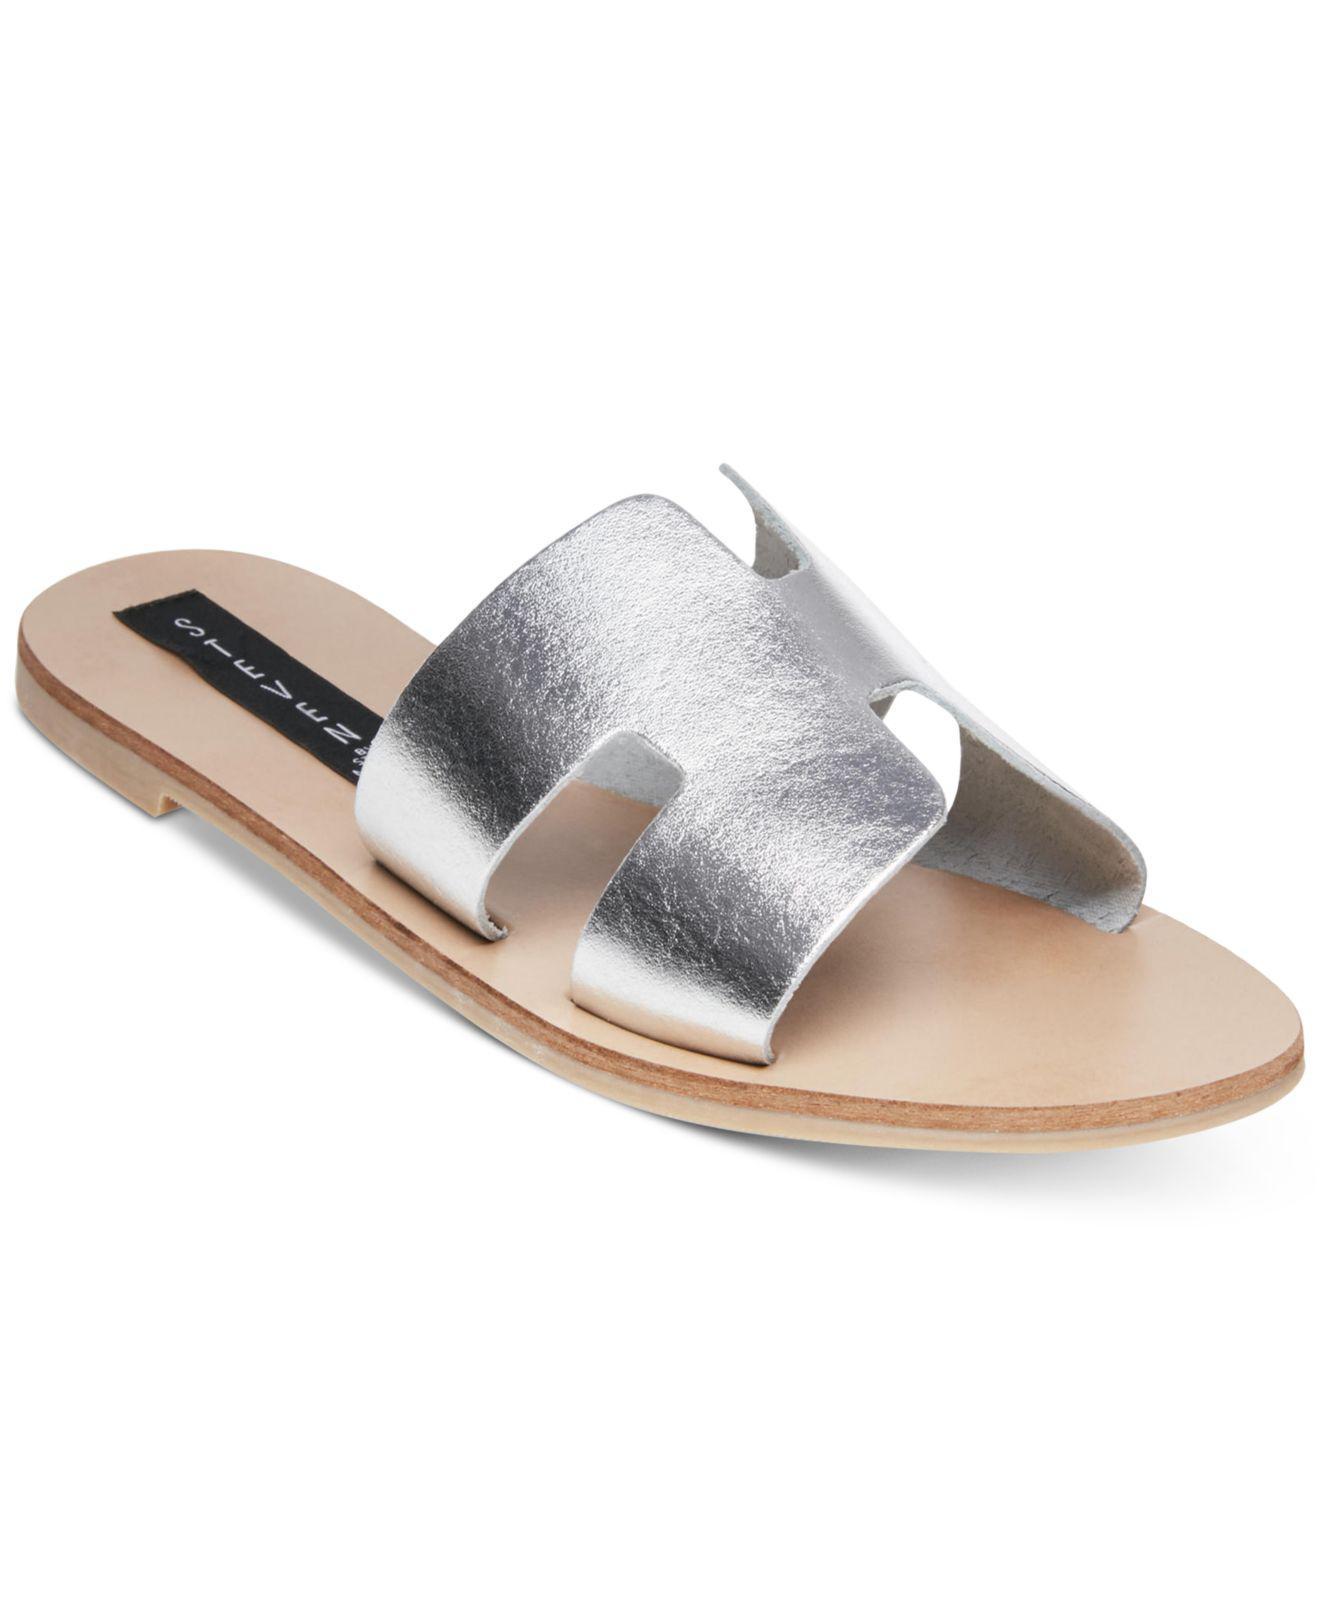 6e0940a1ff4 Lyst - Steven by Steve Madden Greece Sandals in Metallic